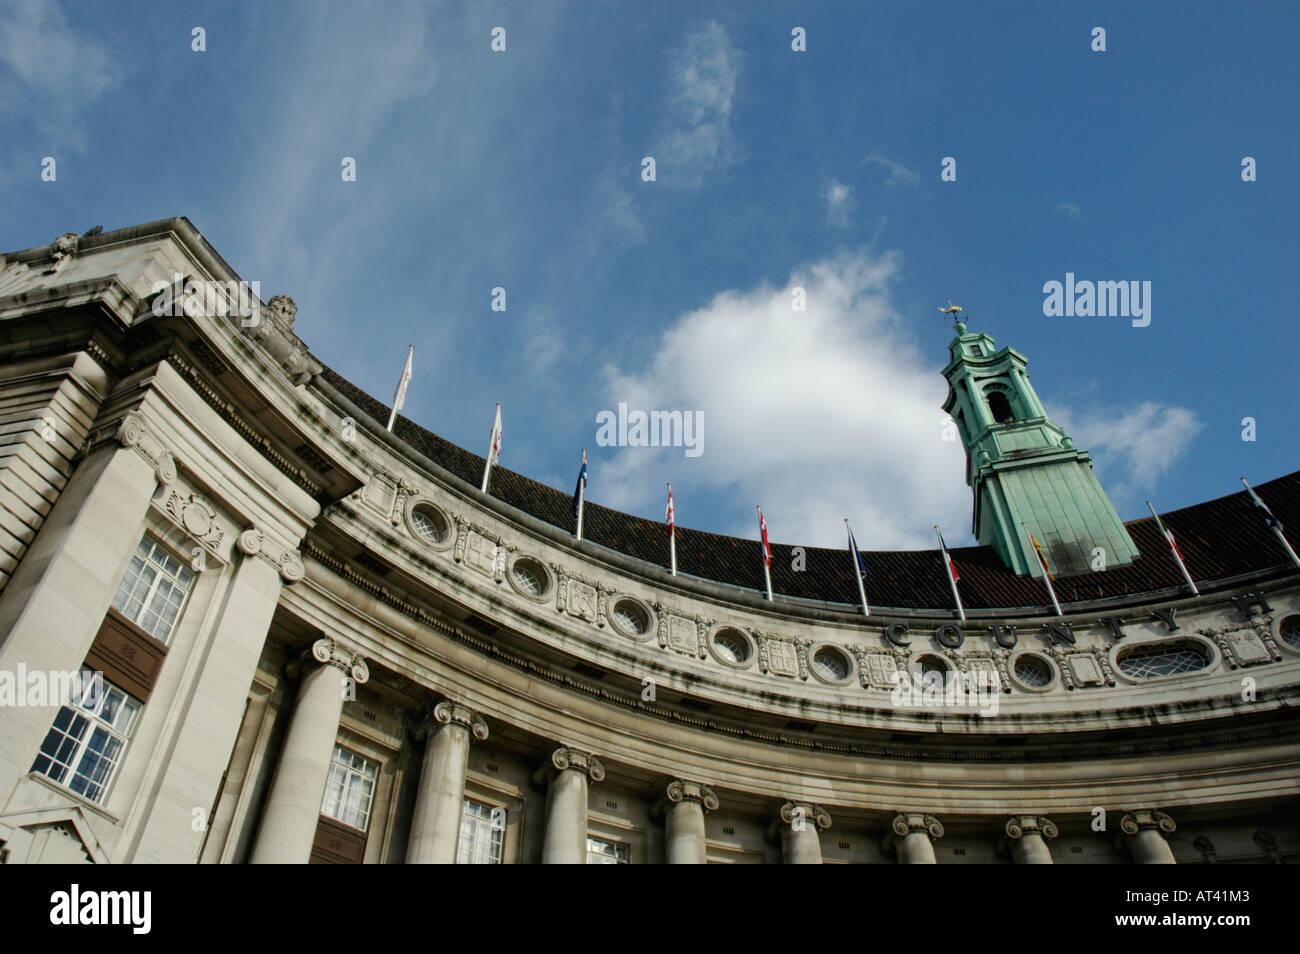 County Hall former GLC headquarters South Bank London England - Stock Image